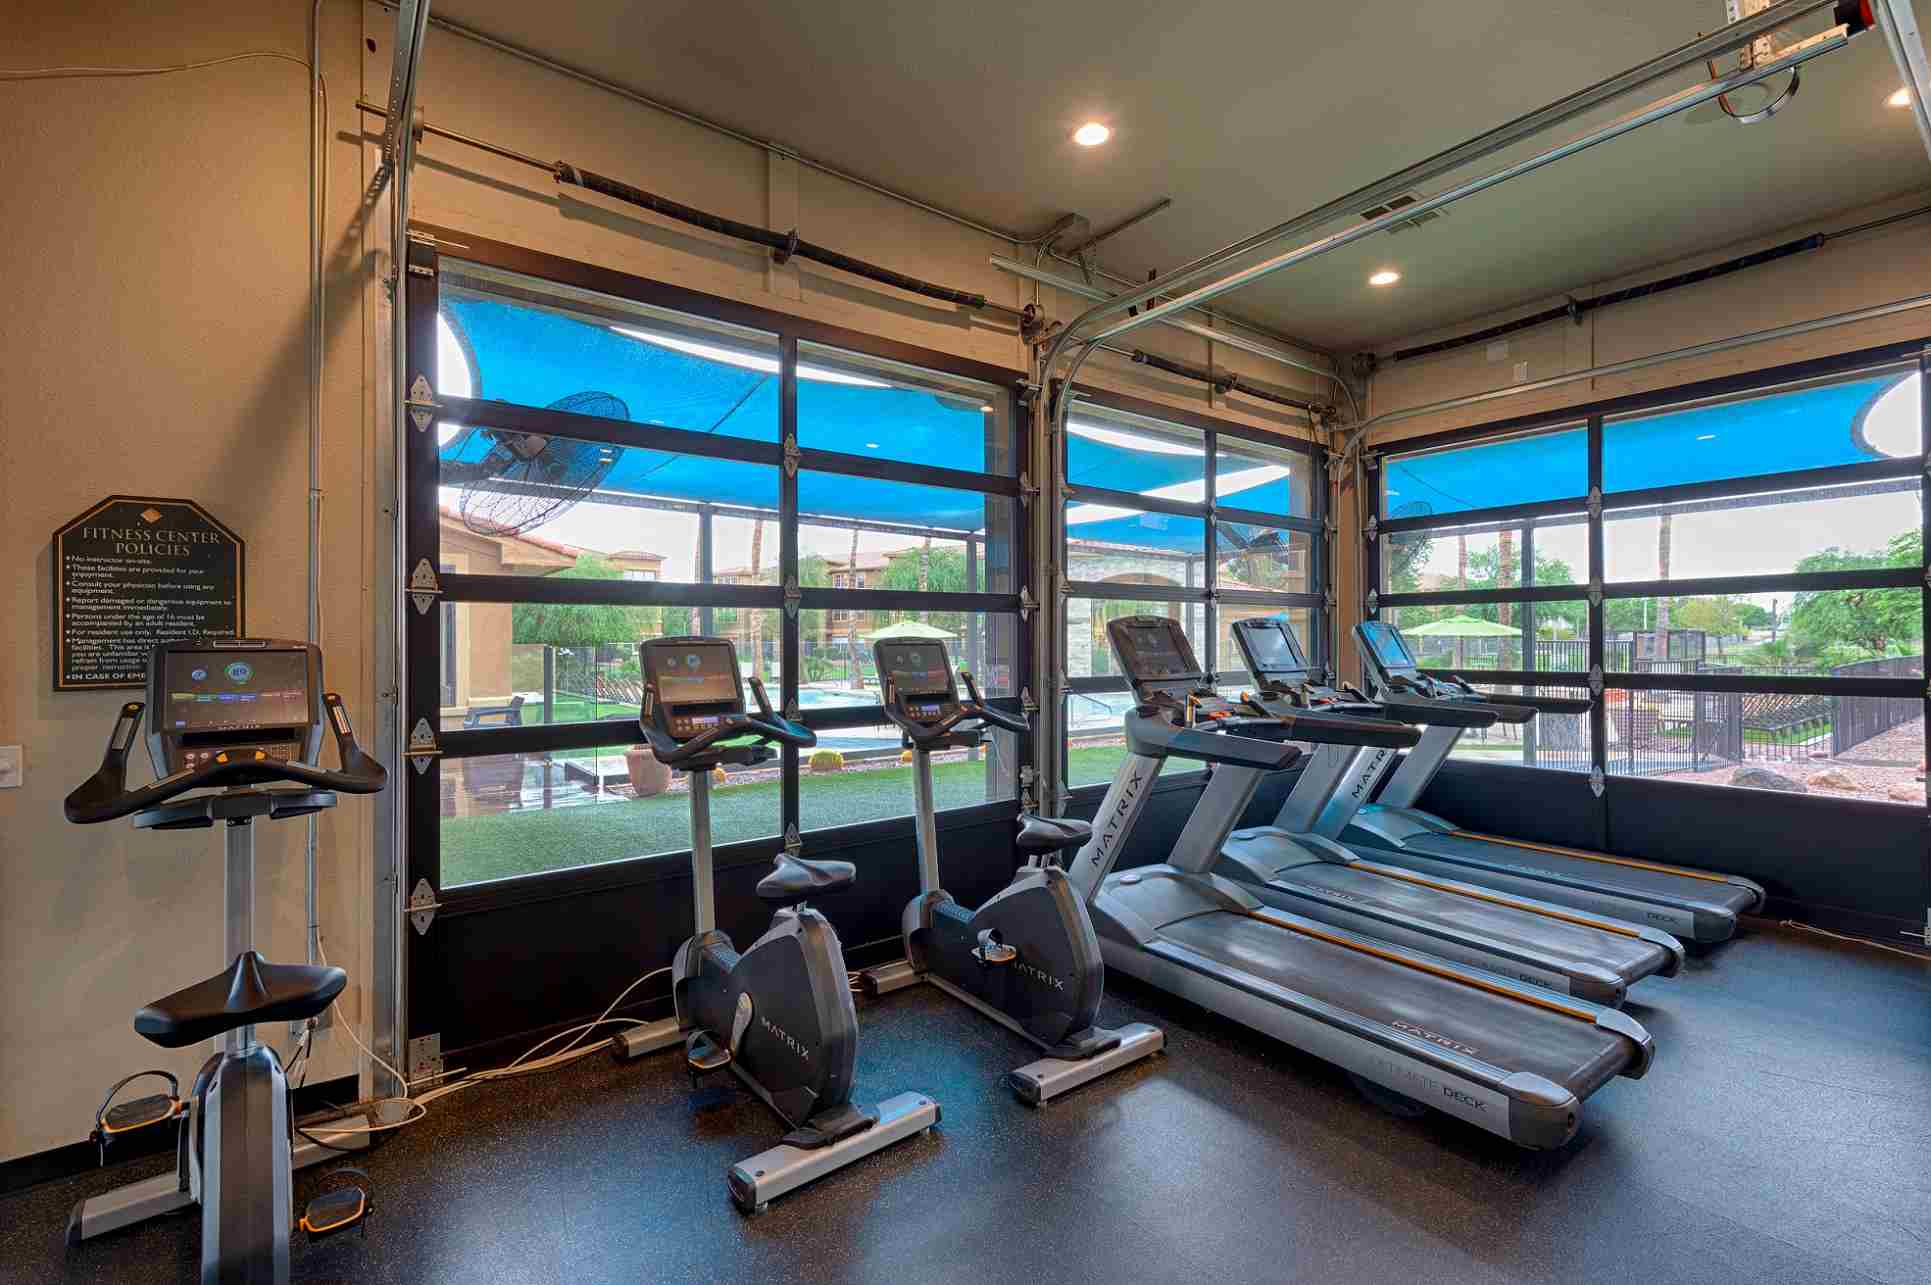 Gateway-At-Tempe-AZ-Fitness-Center-Unilodgers